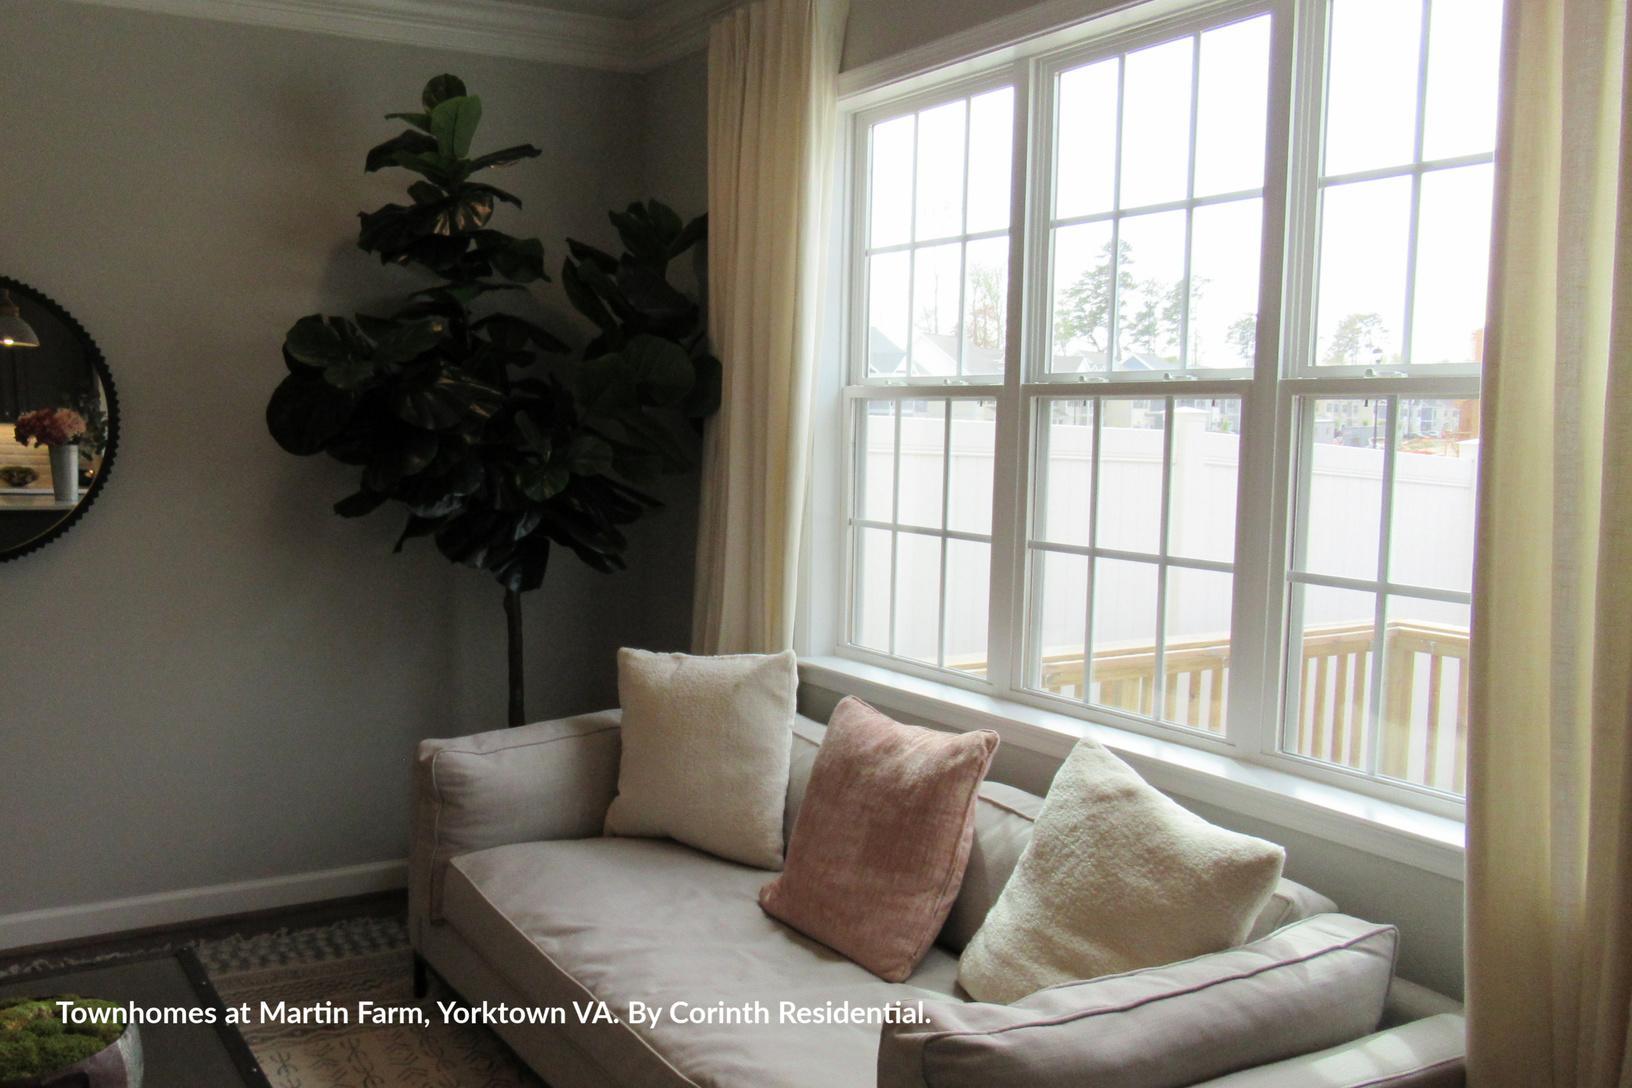 Single-Hung Windows in Model Home - Townhomes at Martin Farm, Yorktown VA